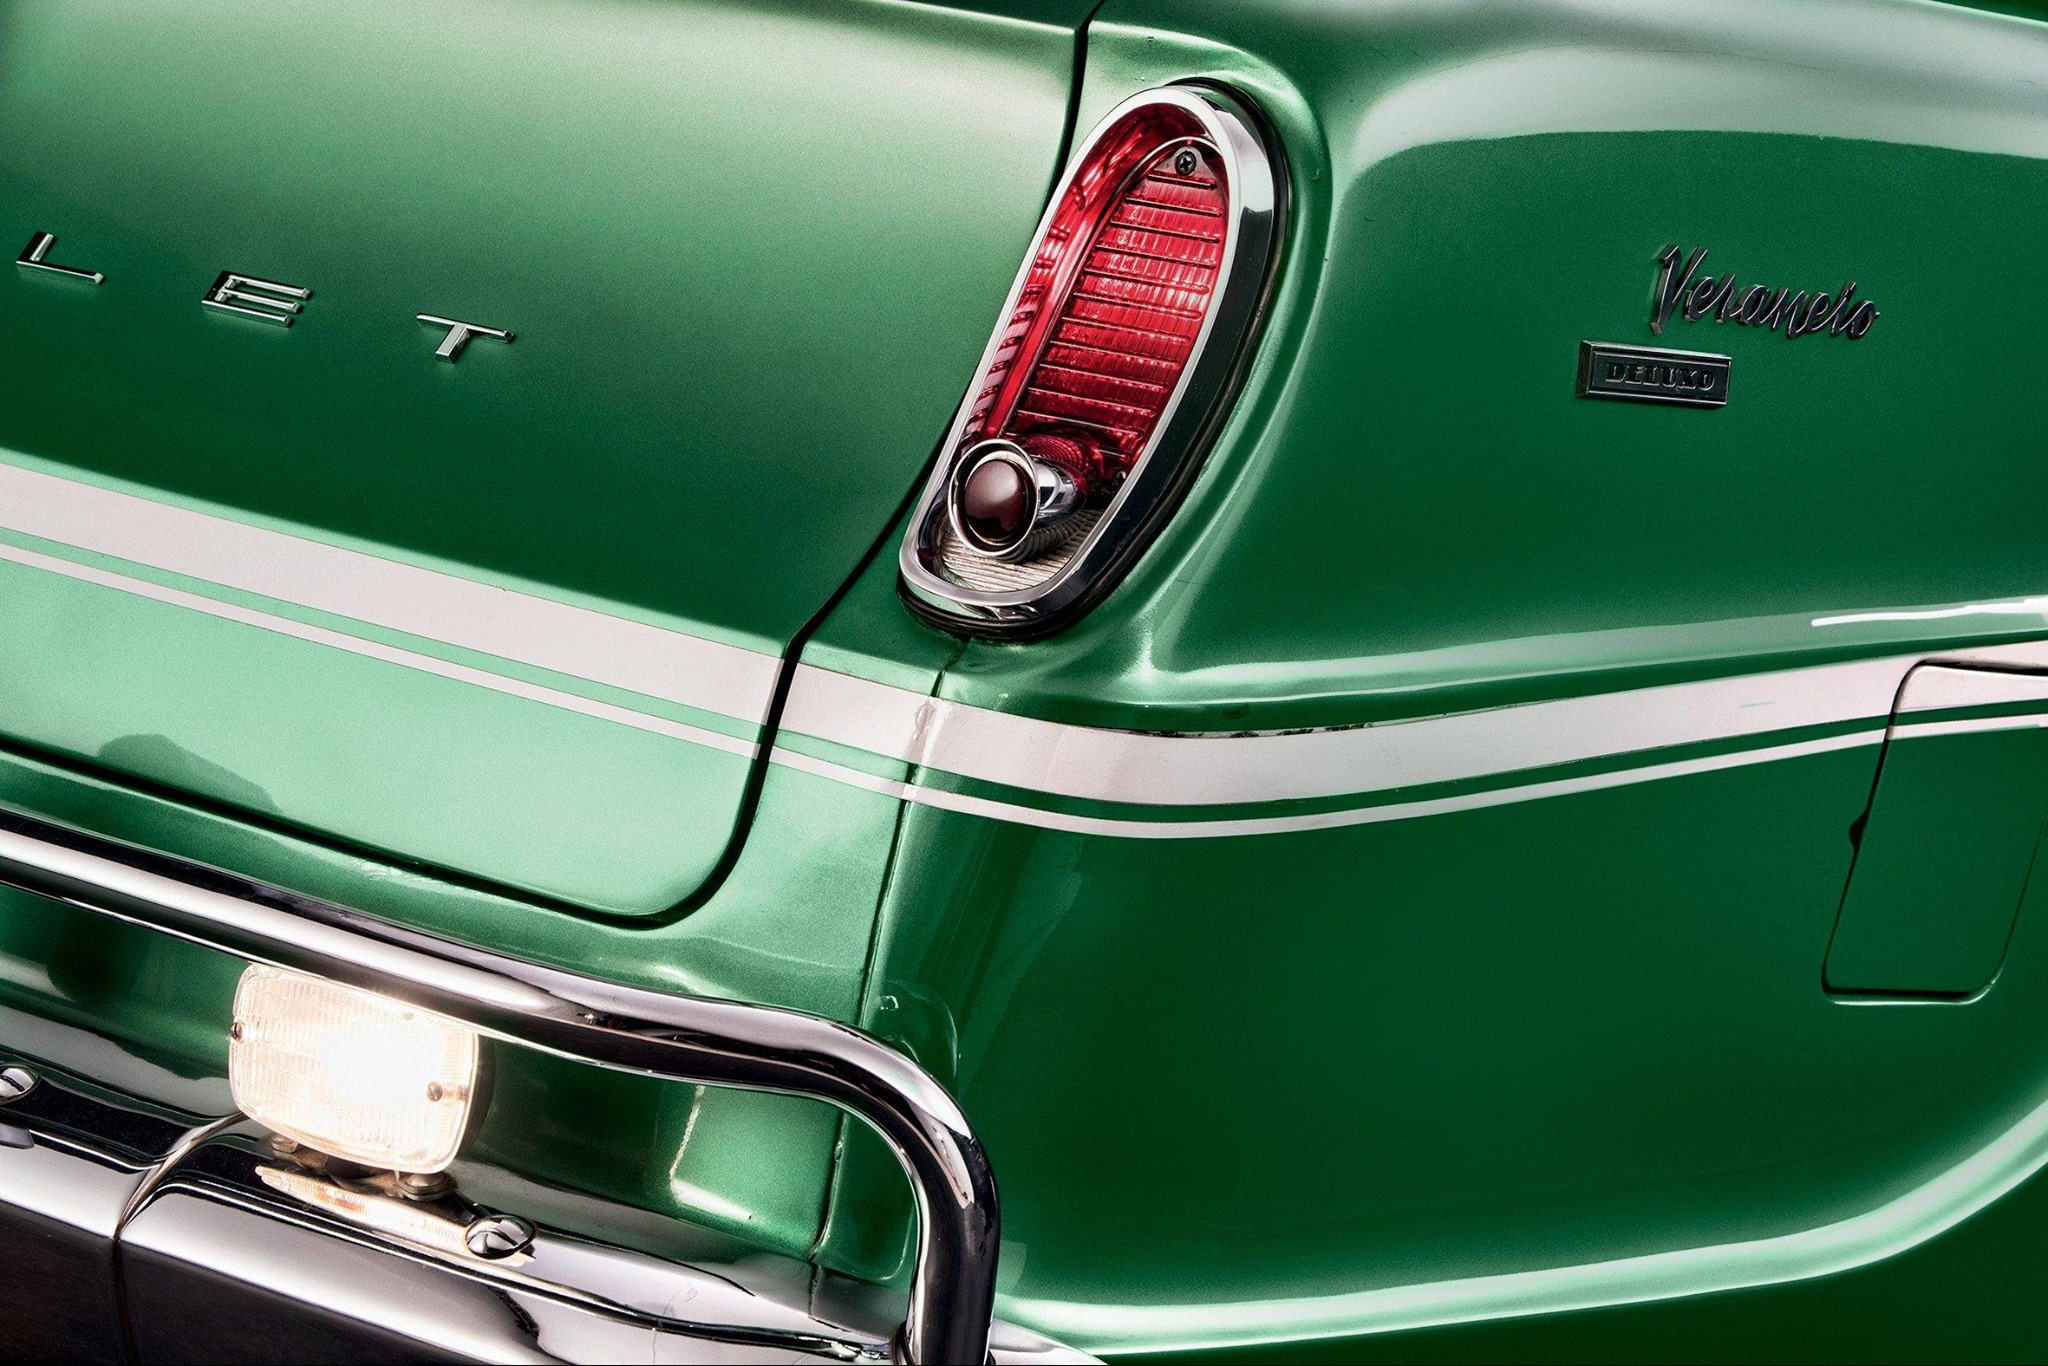 Chevrolet-Veraneio--1964--1994-C-1416-2